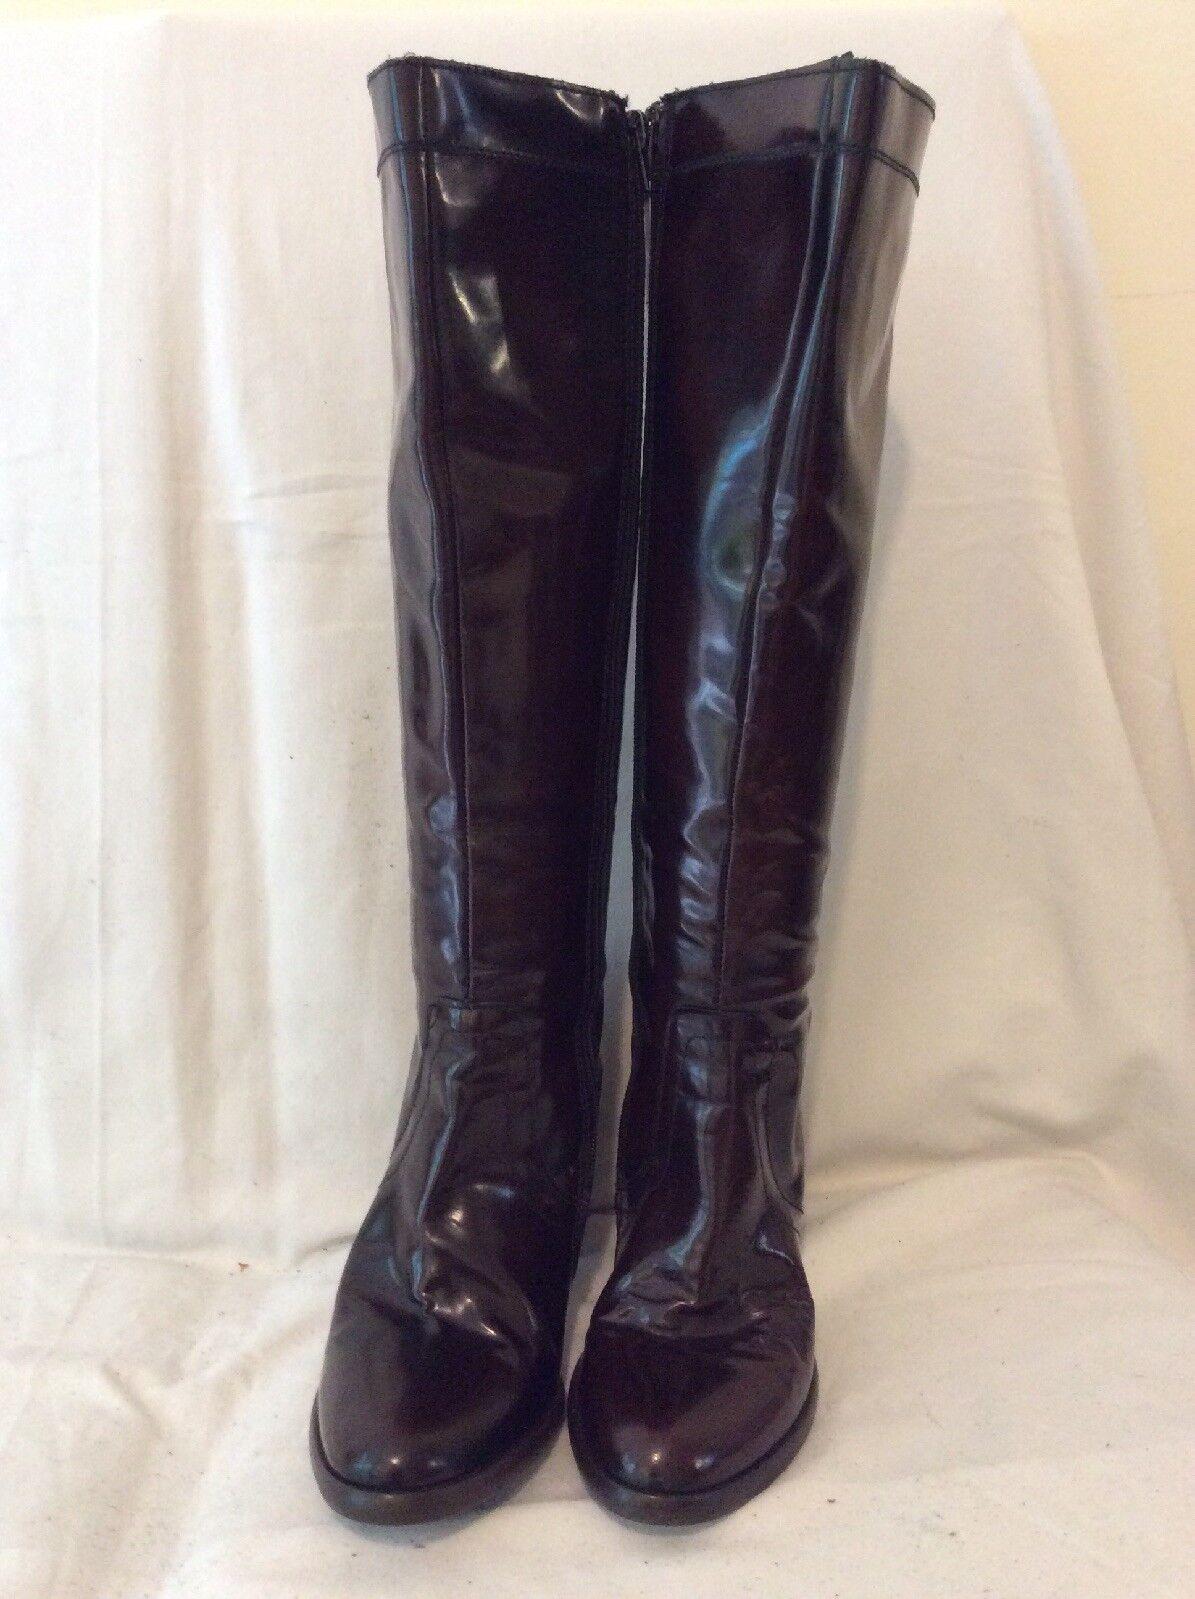 TT Bagatt Braun Knee Größe High Leder Stiefel Größe Knee 38 7b7efc